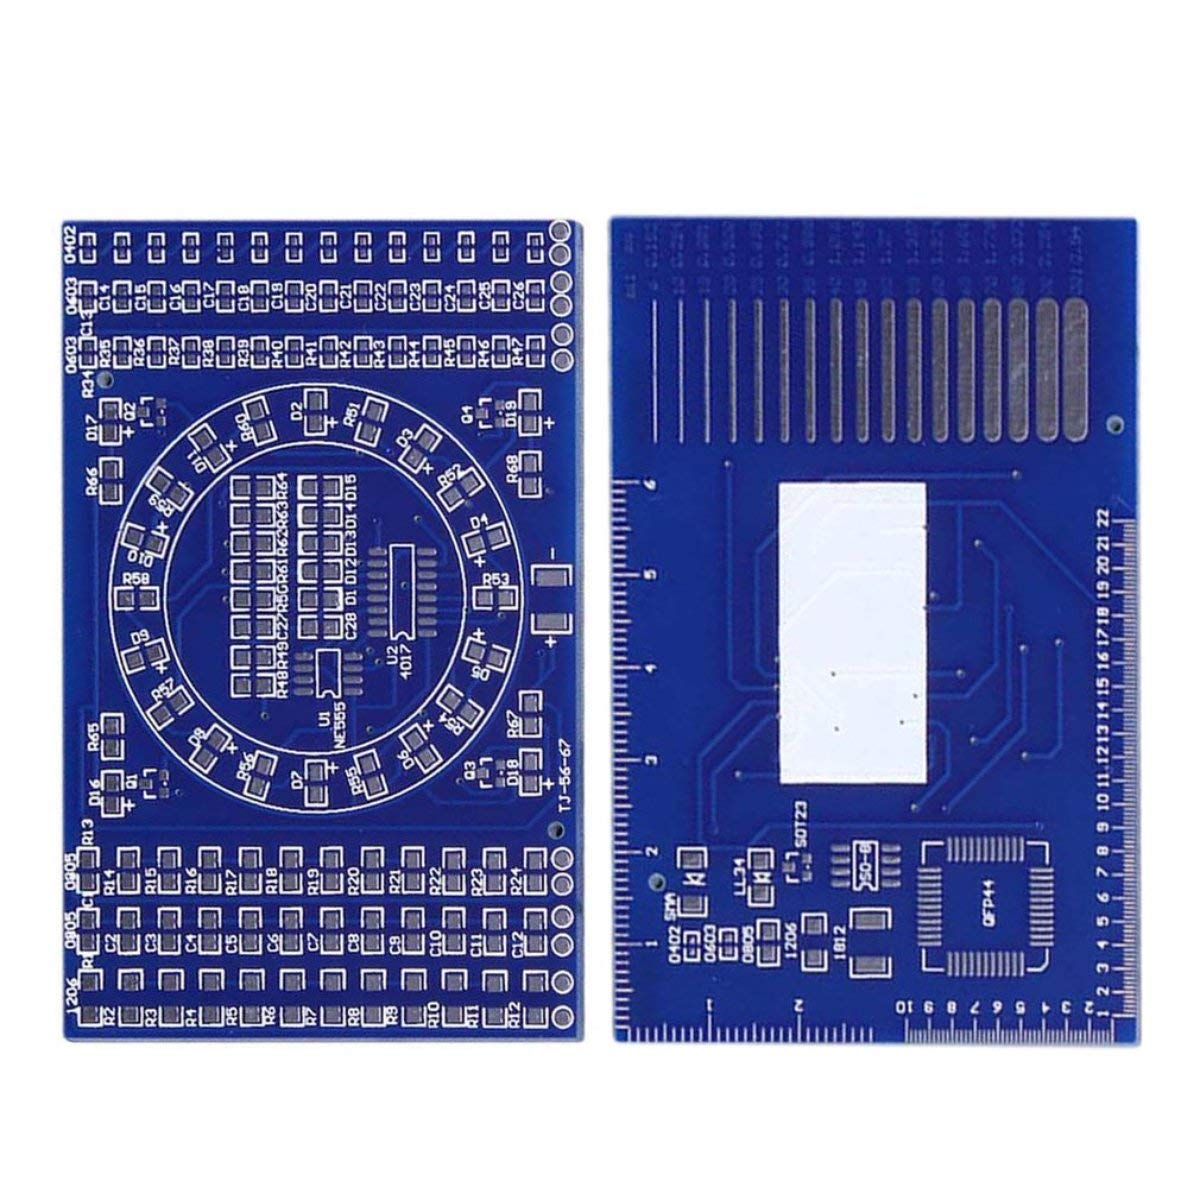 Rotating Flashing LED Components Soldering Practice Board DIY Set Training Set(Color:Blue) Gugutogo